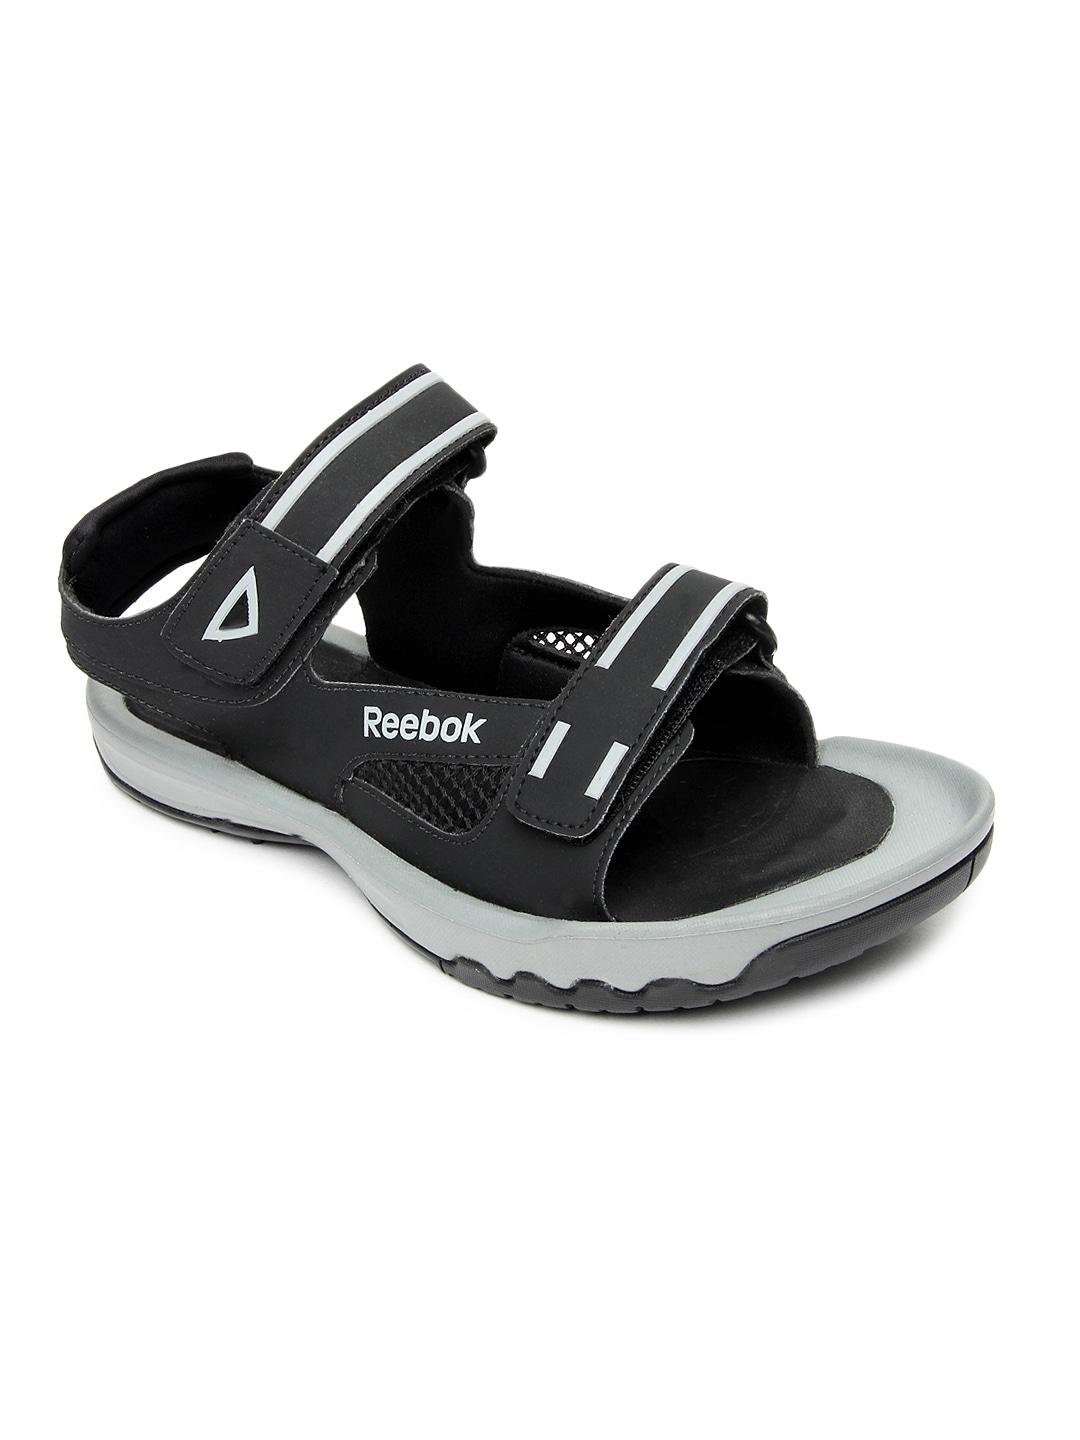 0de88d74d91d Reebok m41044 Men Black Sports Sandals - Best Price in India ...